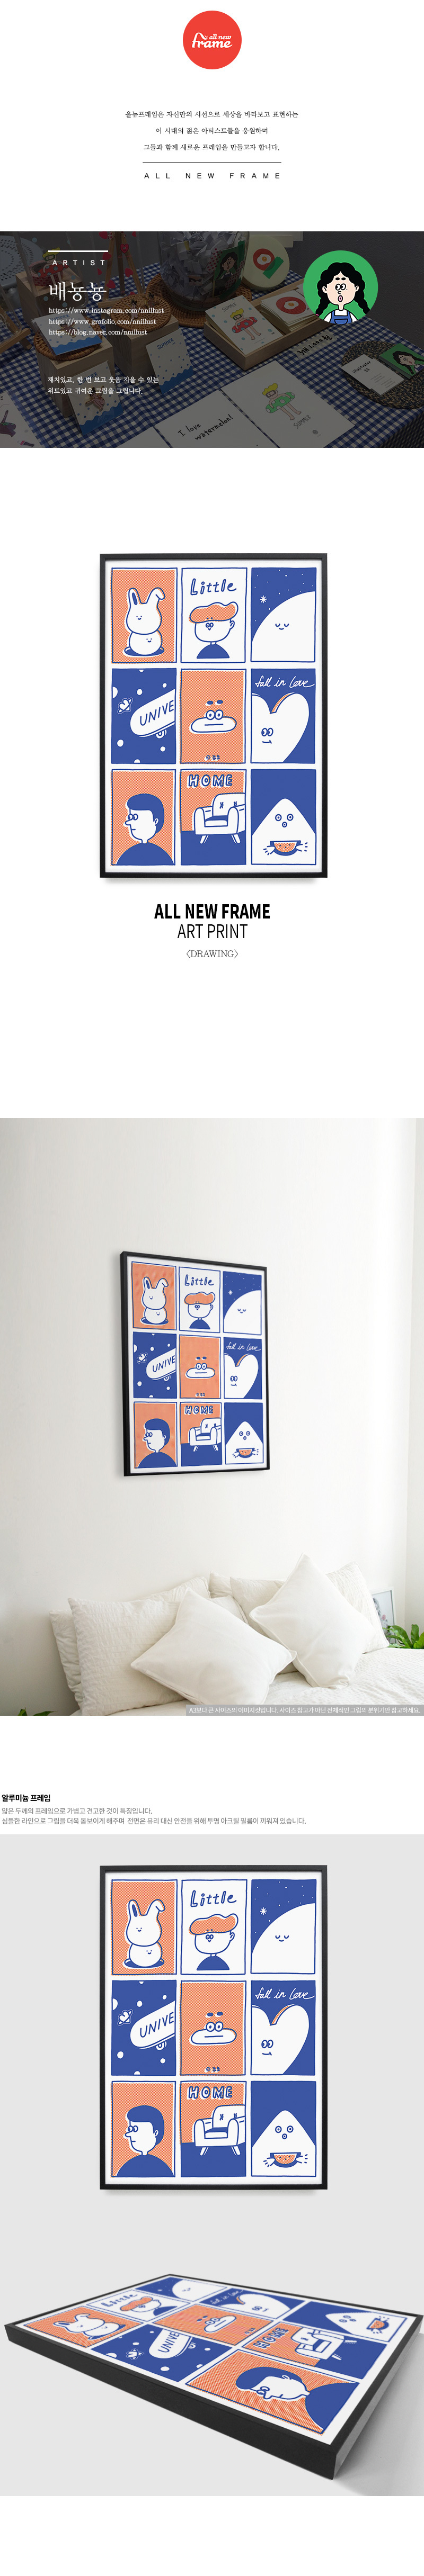 DRAWING- 일러스트 액자 - 올뉴프레임, 55,000원, 홈갤러리, 캔버스아트